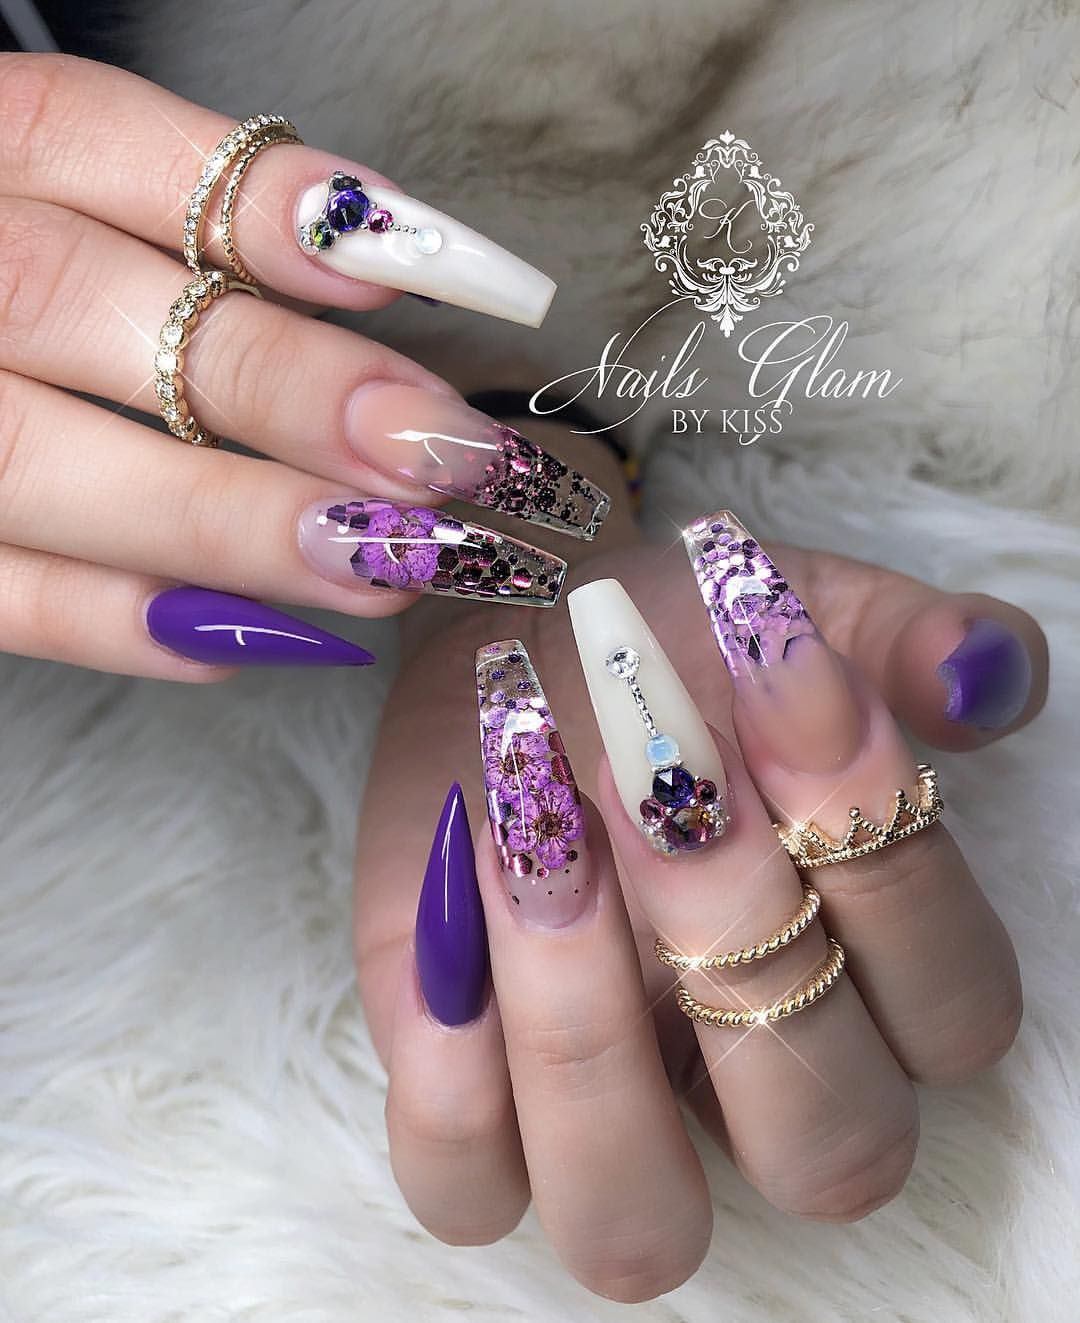 Dried flowers with glitter 💜🌸💜🌸 💋 . 💋 . 💋 . 💋 . 💋 #vegas_nay #wakeupandmakeup #melformakeup #hudabeauty #makeupvideoss #lillyghalichi…